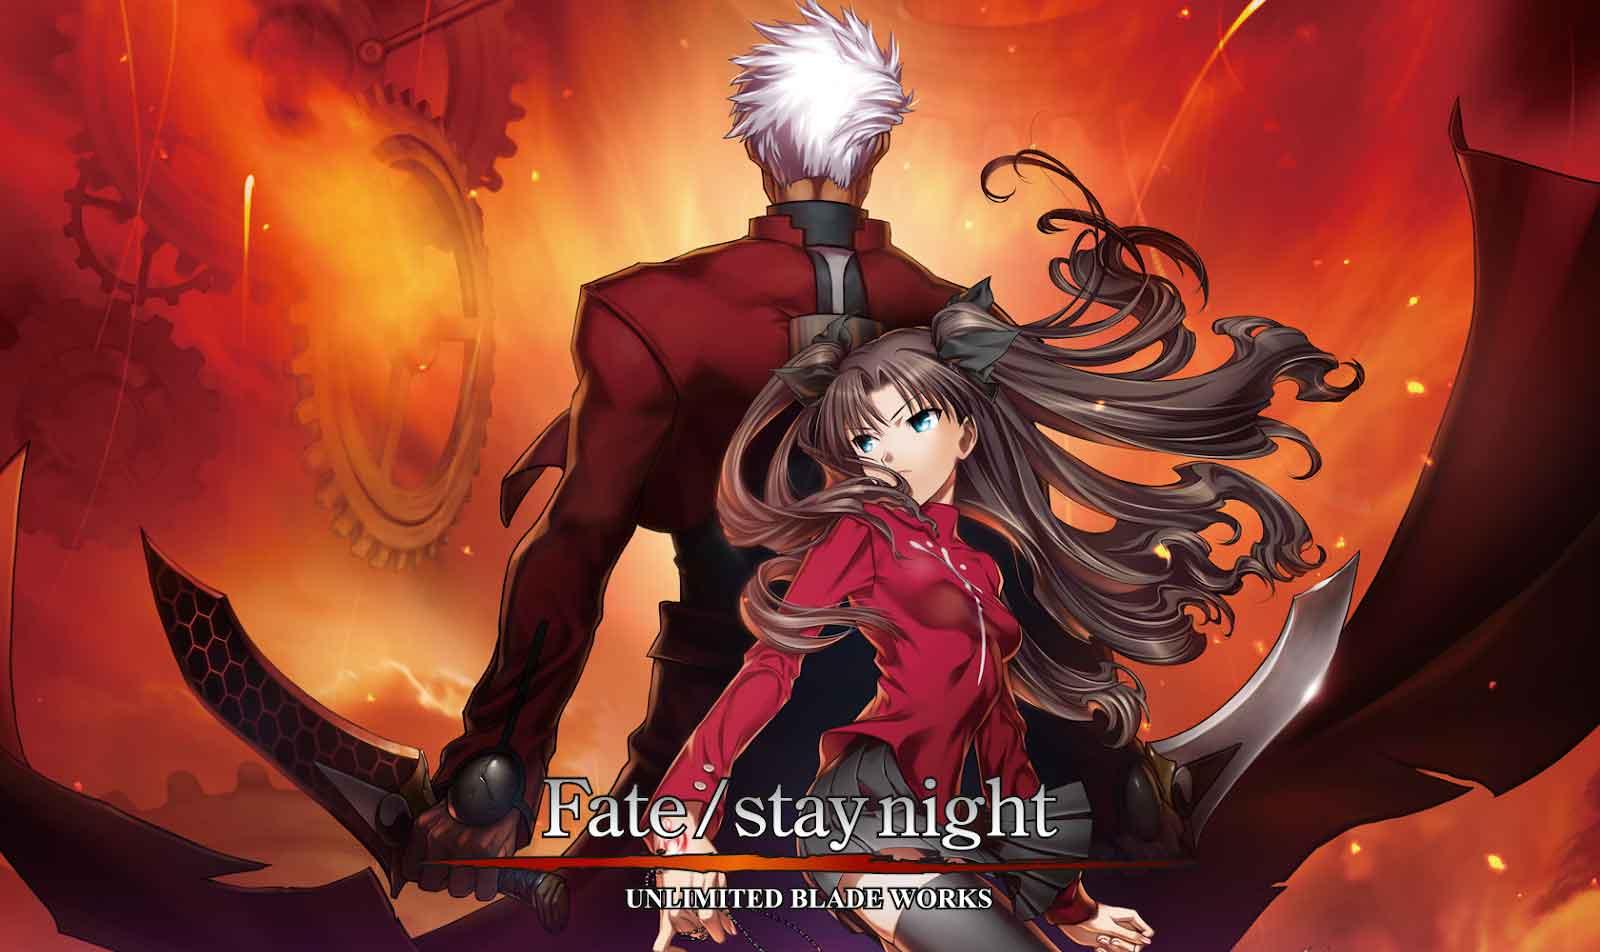 Fate/Stay Night: Unlimited Blade Works BD (Season 1 & Season 2) Subtitle Indonesia + OVA